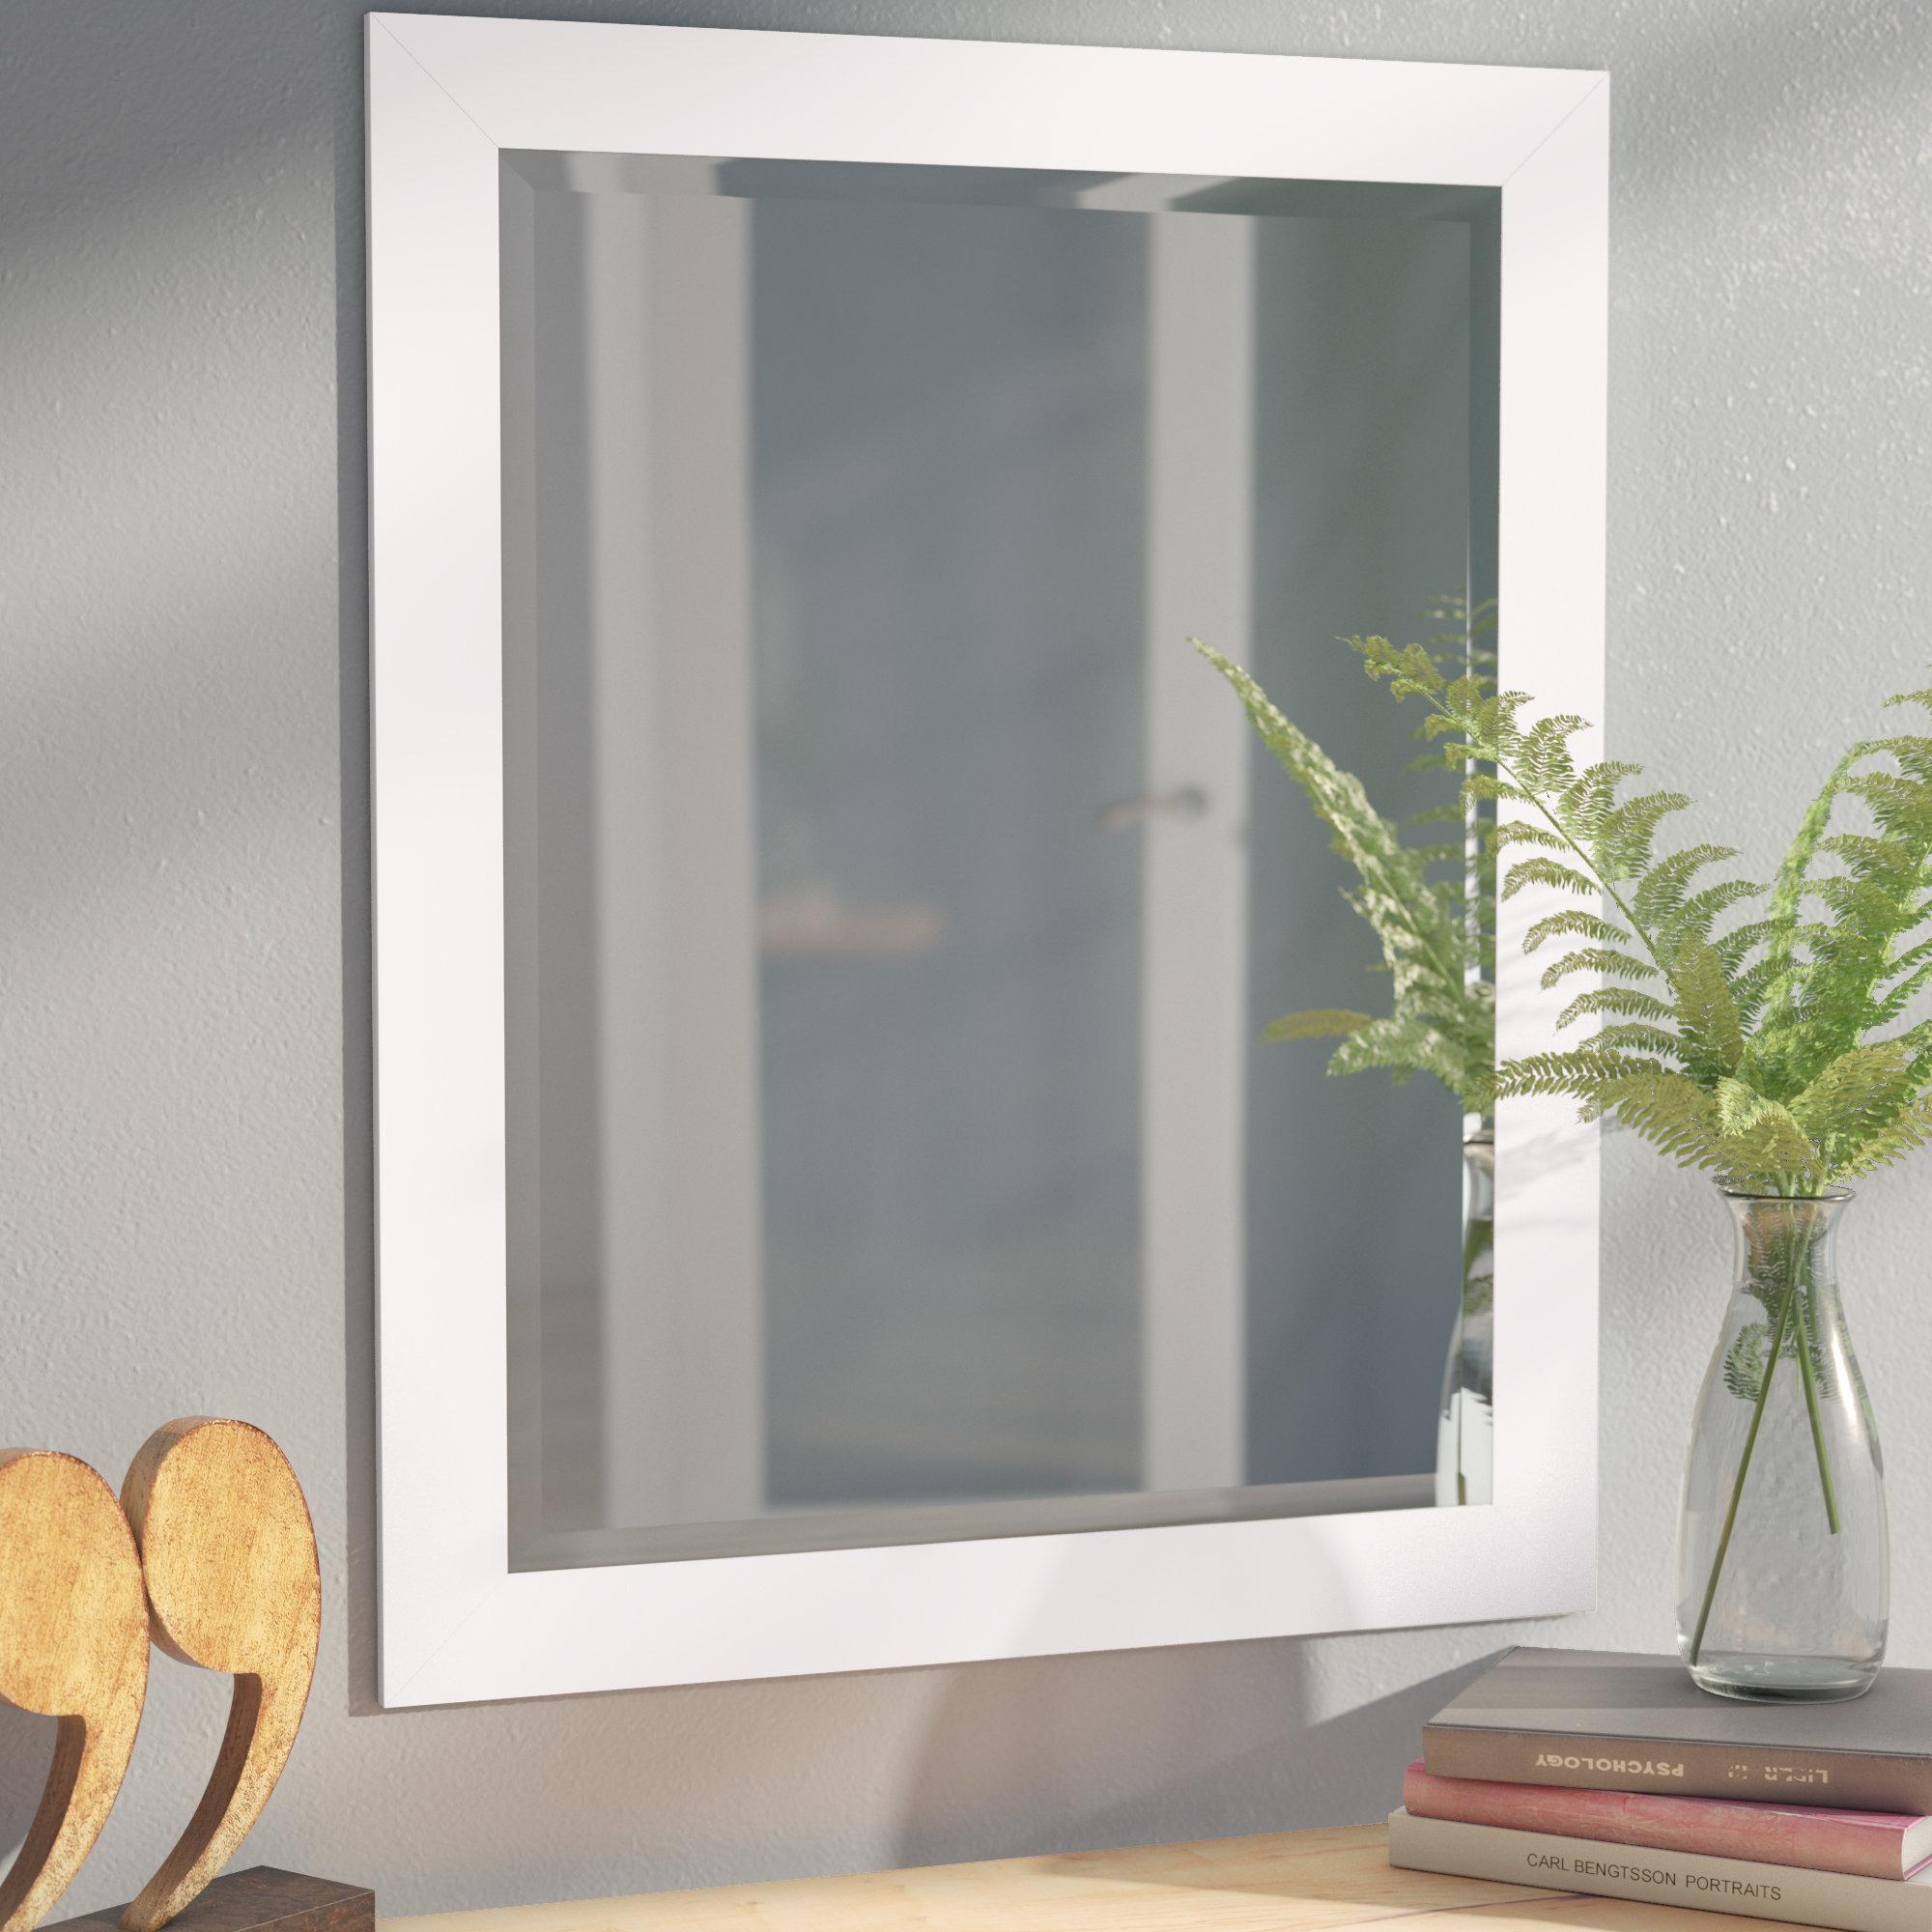 40 Inch Beveled Mirror | Wayfair Pertaining To Lidya Frameless Beveled Wall Mirrors (View 15 of 20)